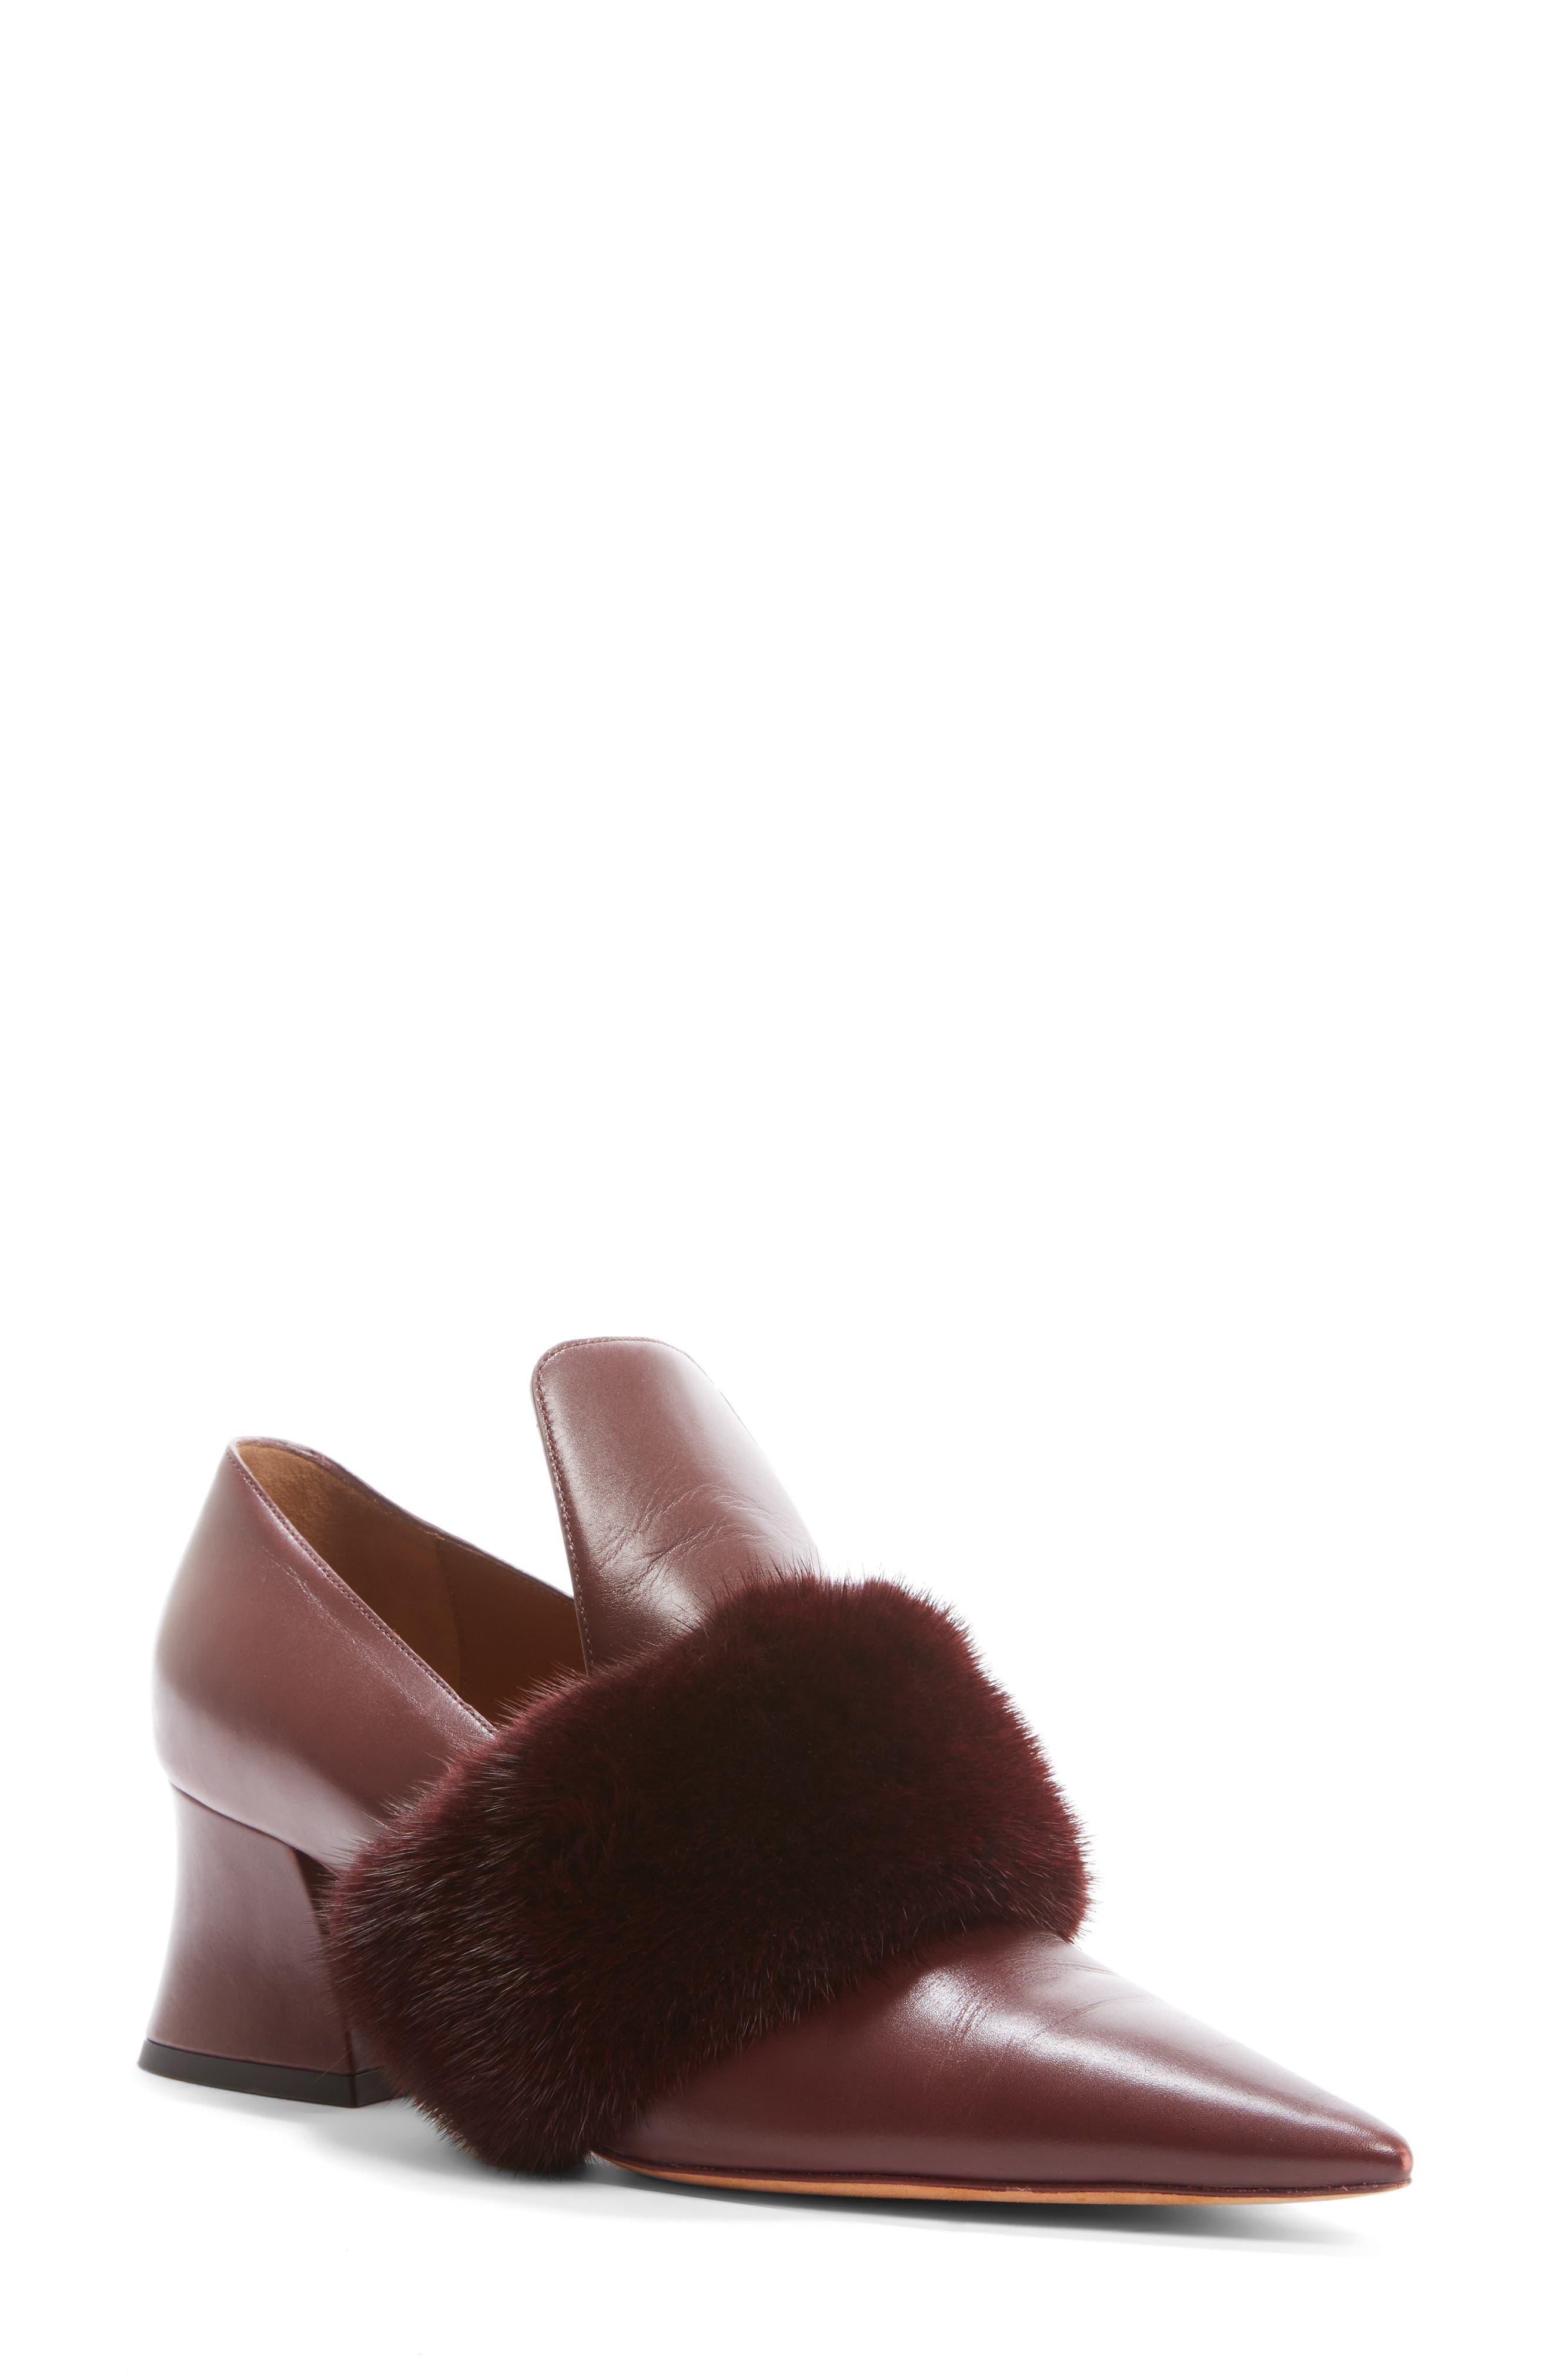 Patricia Pump with Genuine Mink Fur Trim,                             Main thumbnail 1, color,                             930